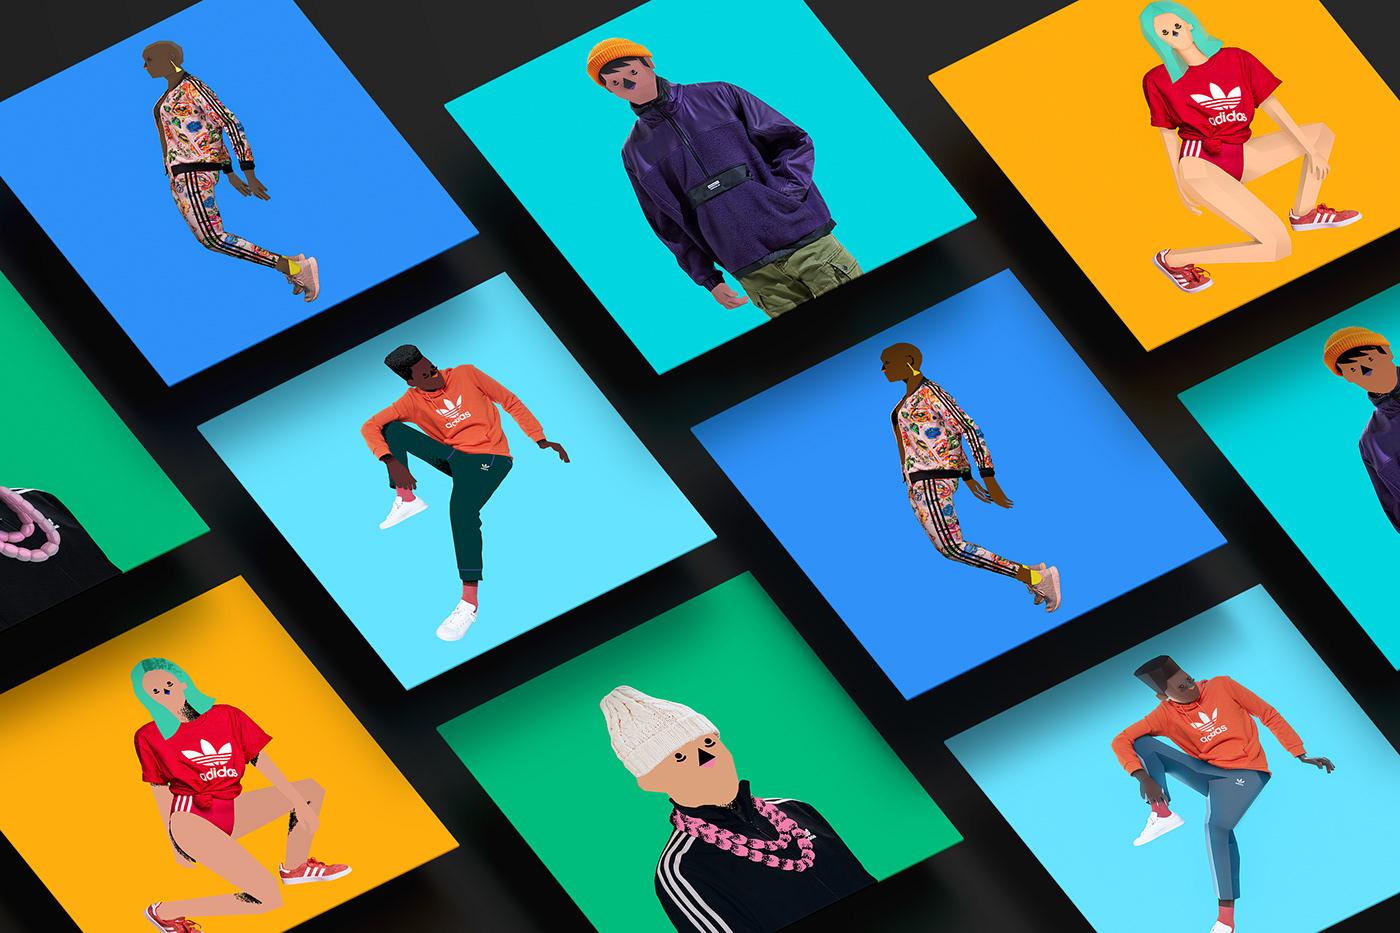 2D 3D adidas adidas originals cinema 4d Fashion  ILLUSTRATION  Octane Render photoshop Procreate